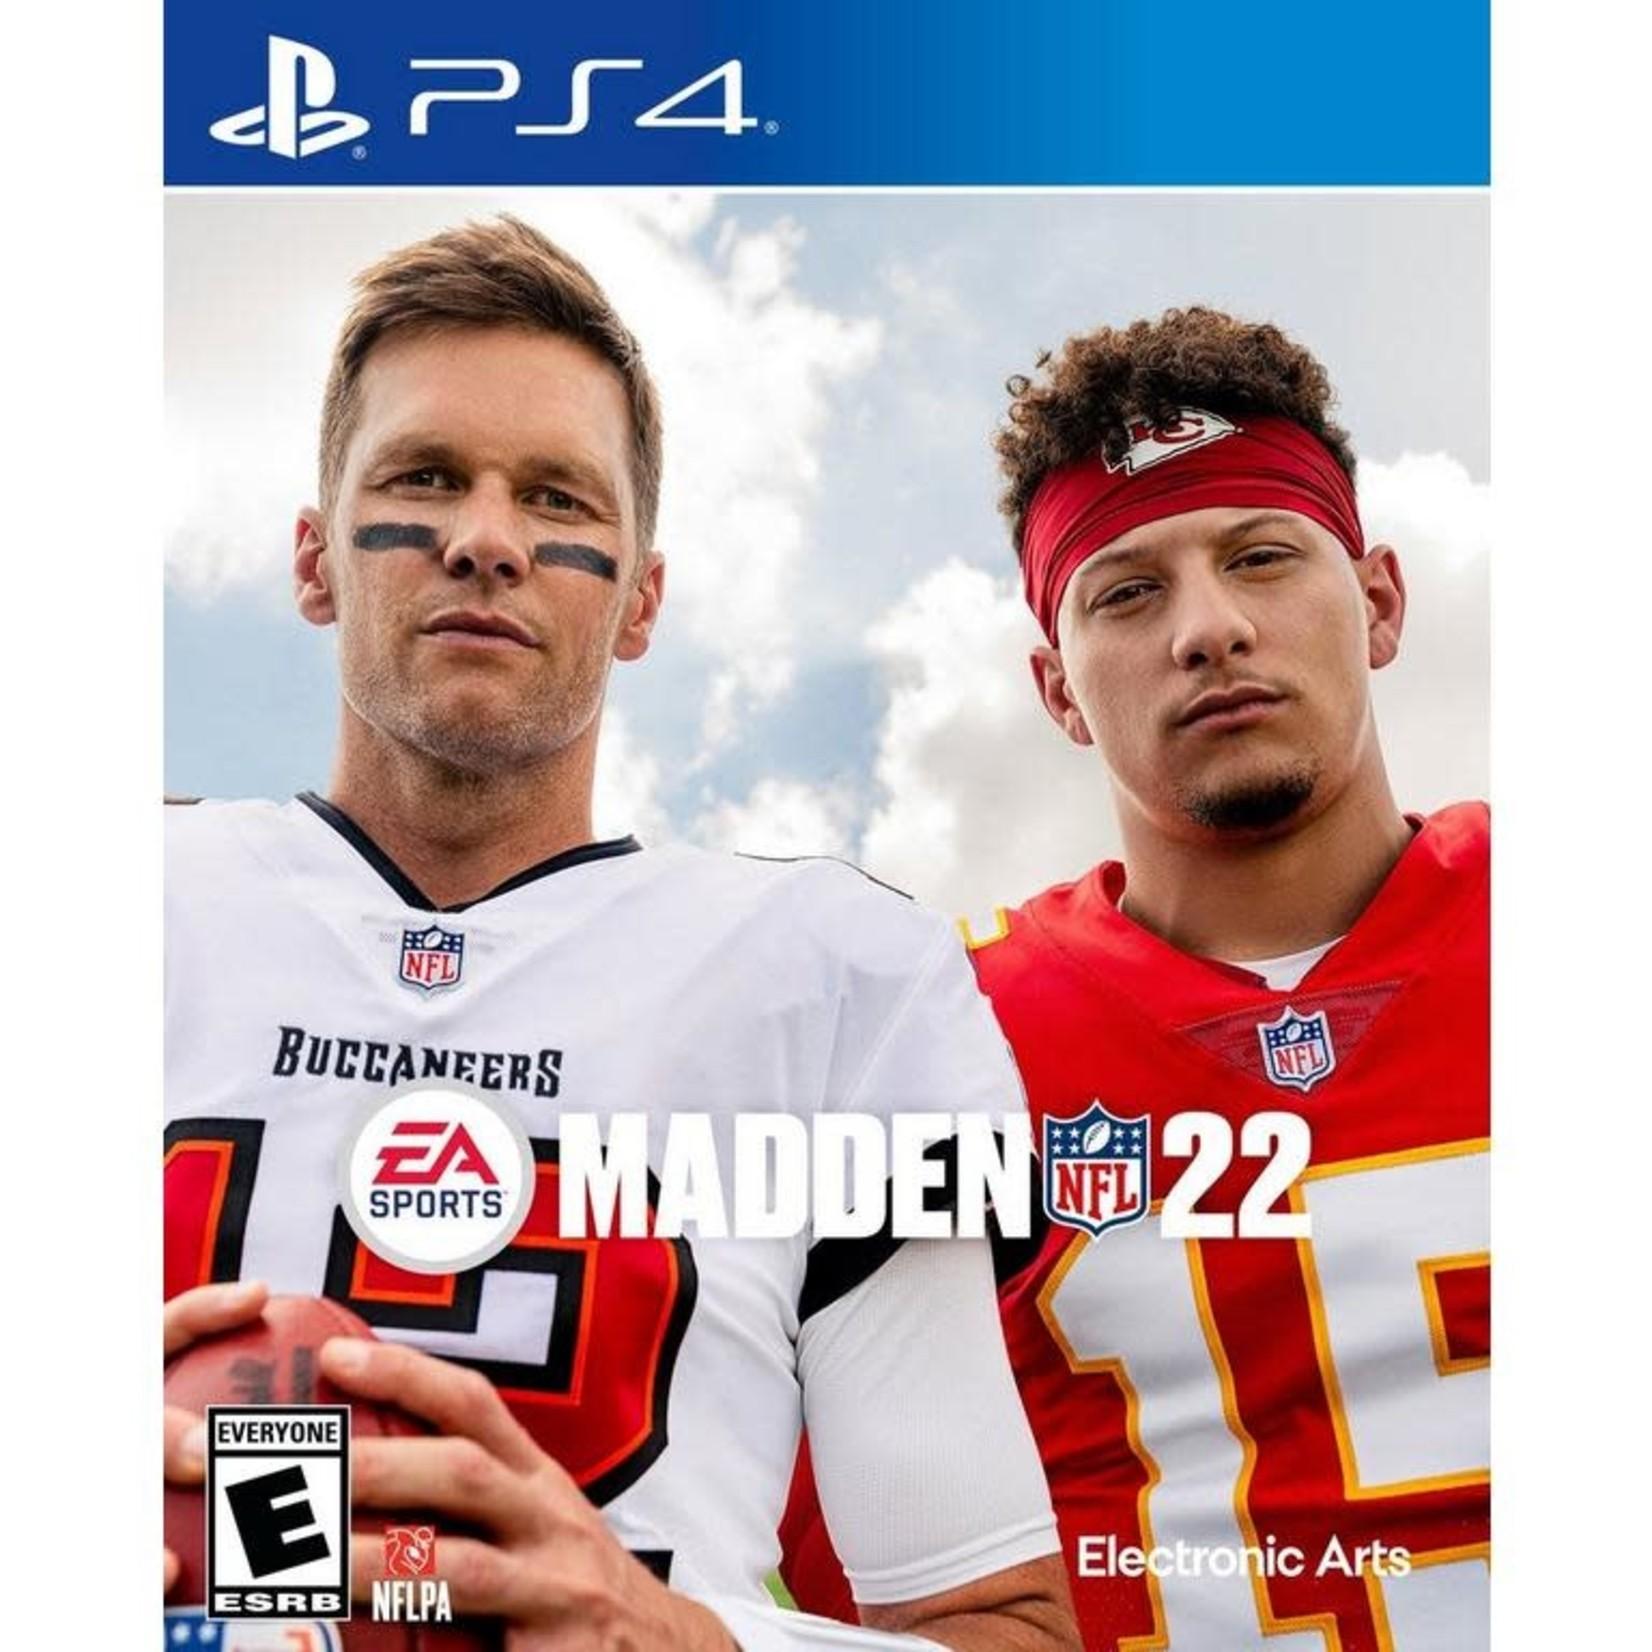 PS4-Madden NFL 22